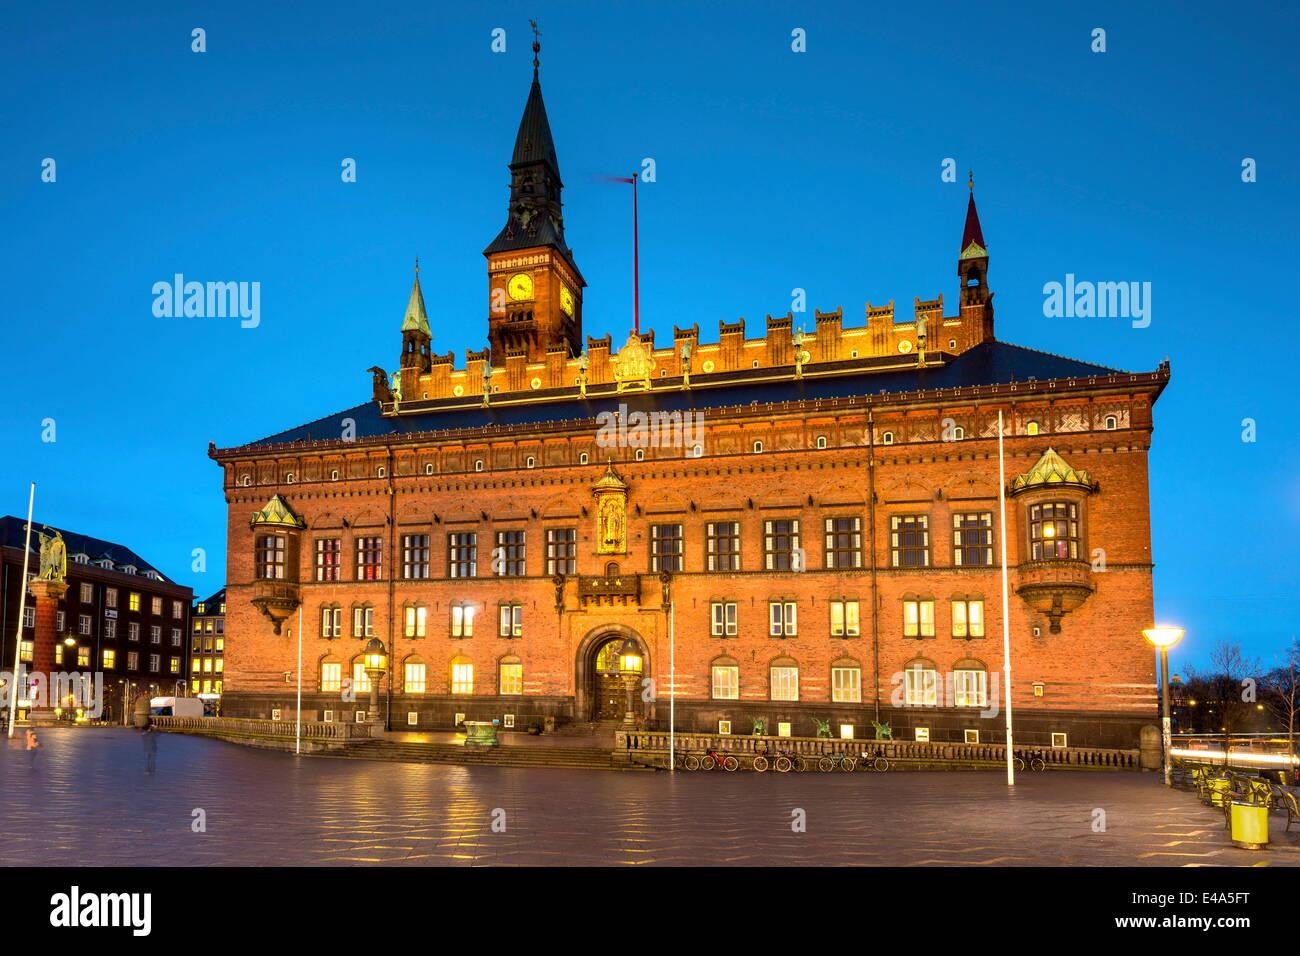 Kopenhagener Rathaus beleuchtet in der Abenddämmerung, Kopenhagen, Dänemark, Skandinavien, Europa Stockbild